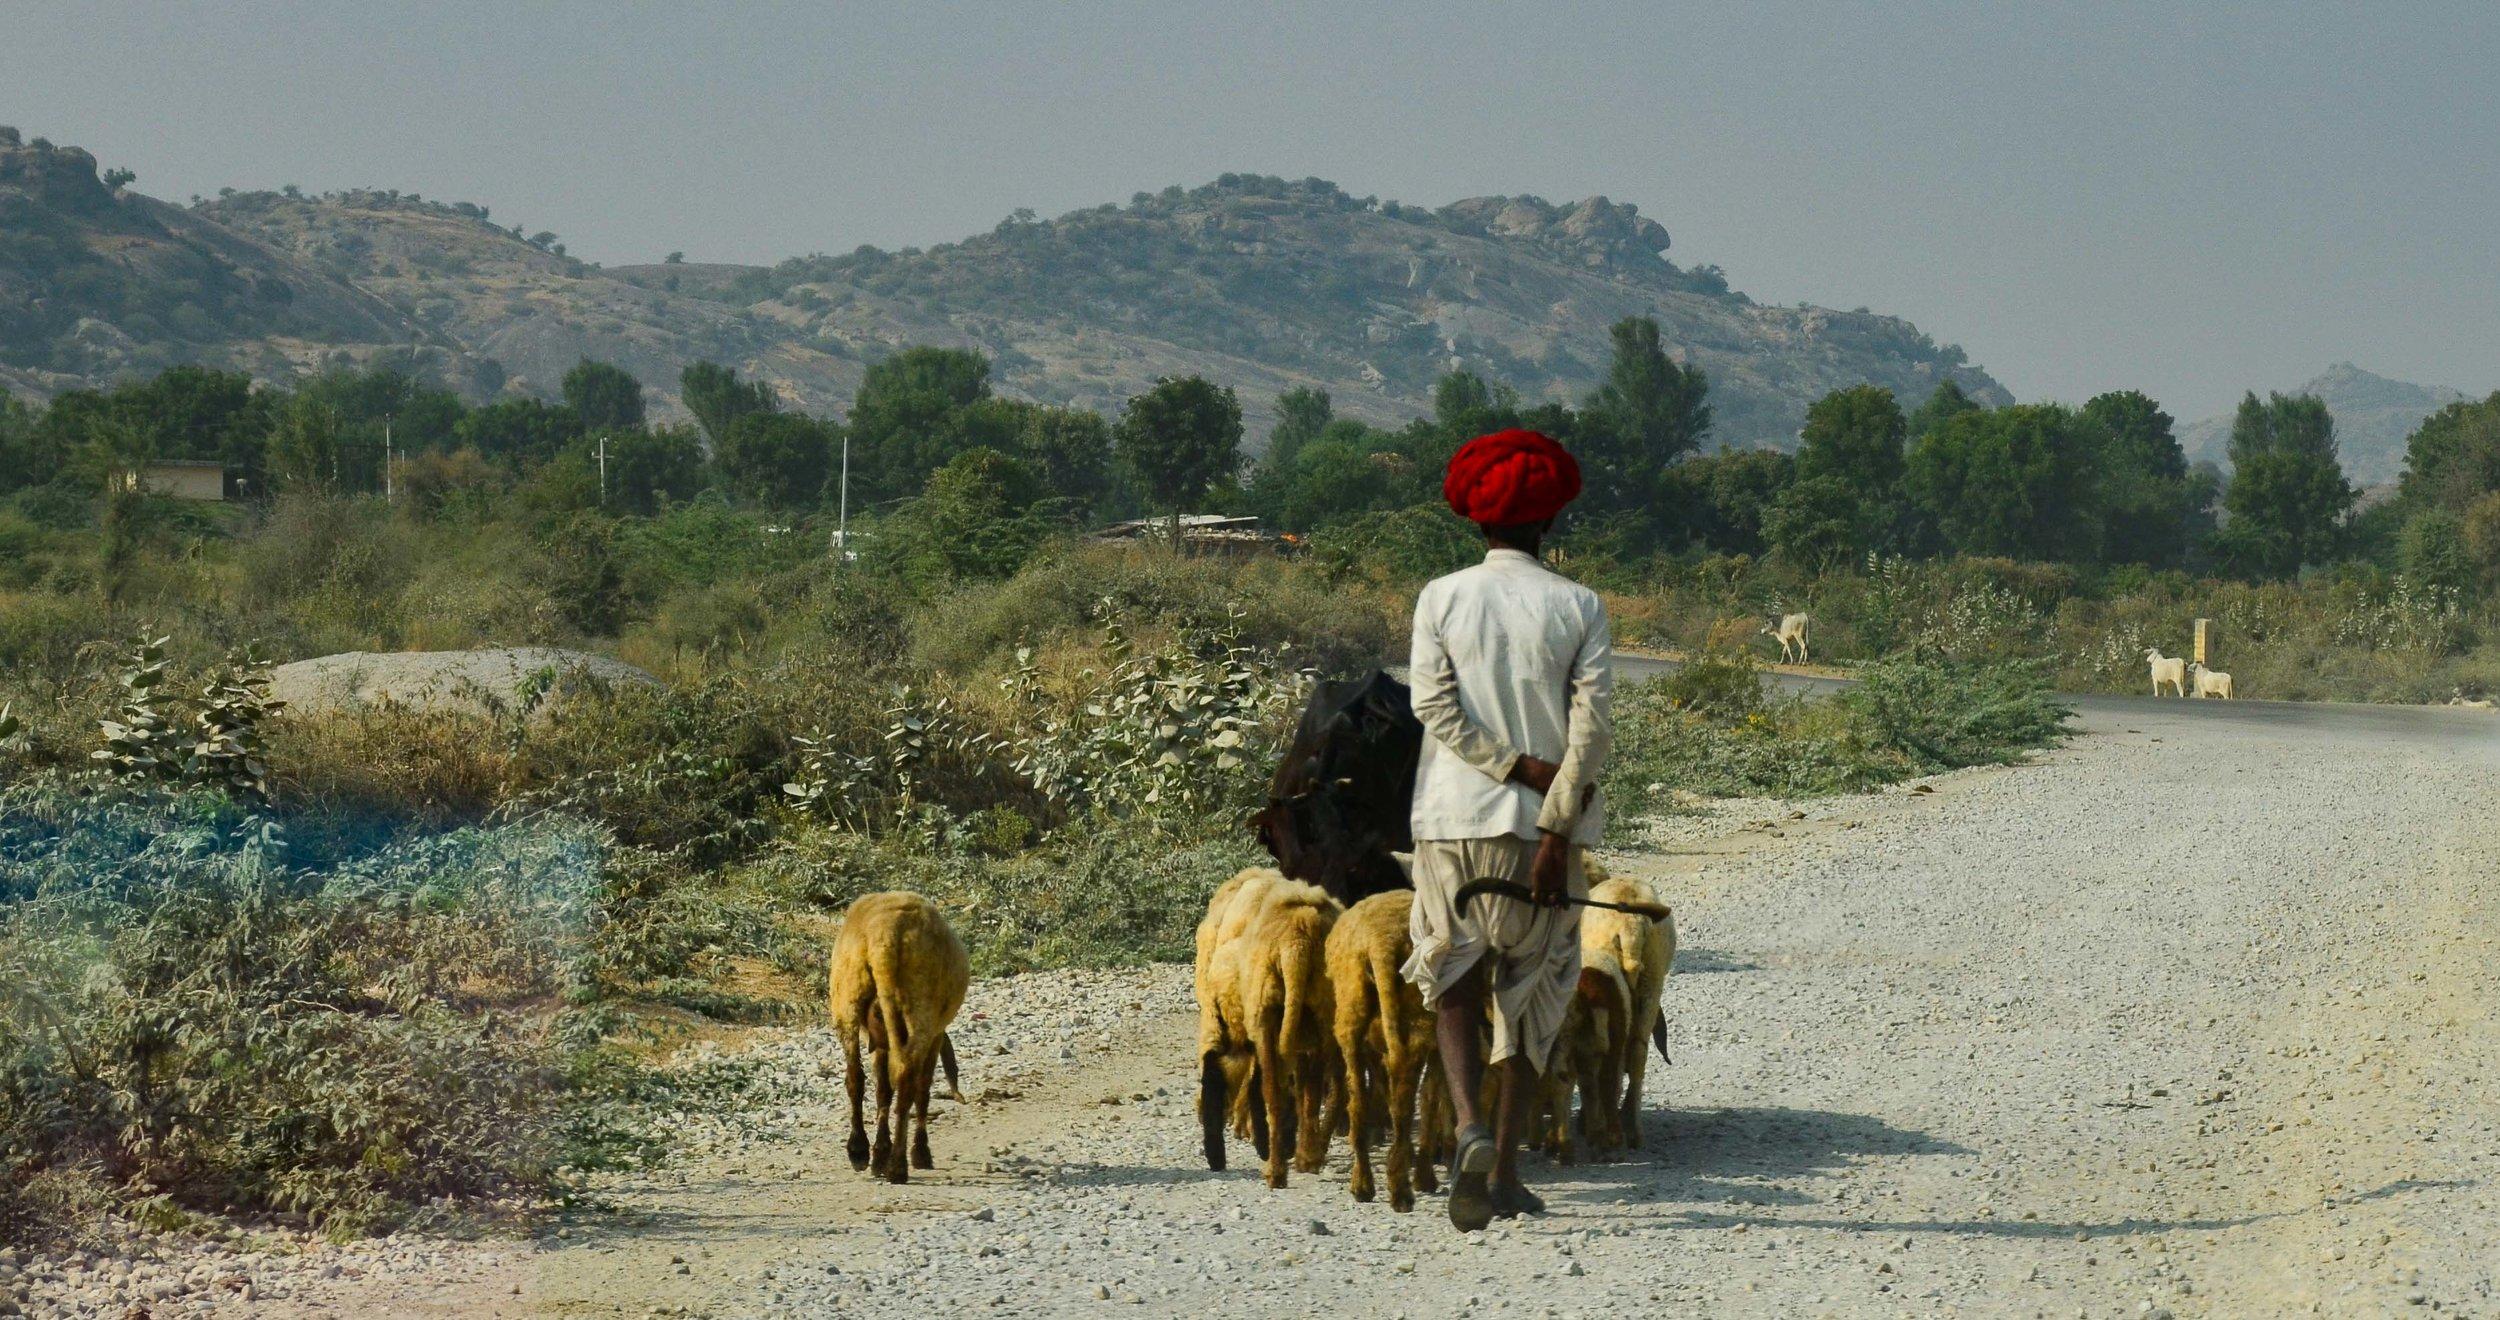 Red Turbin. jodhpur, India 2012